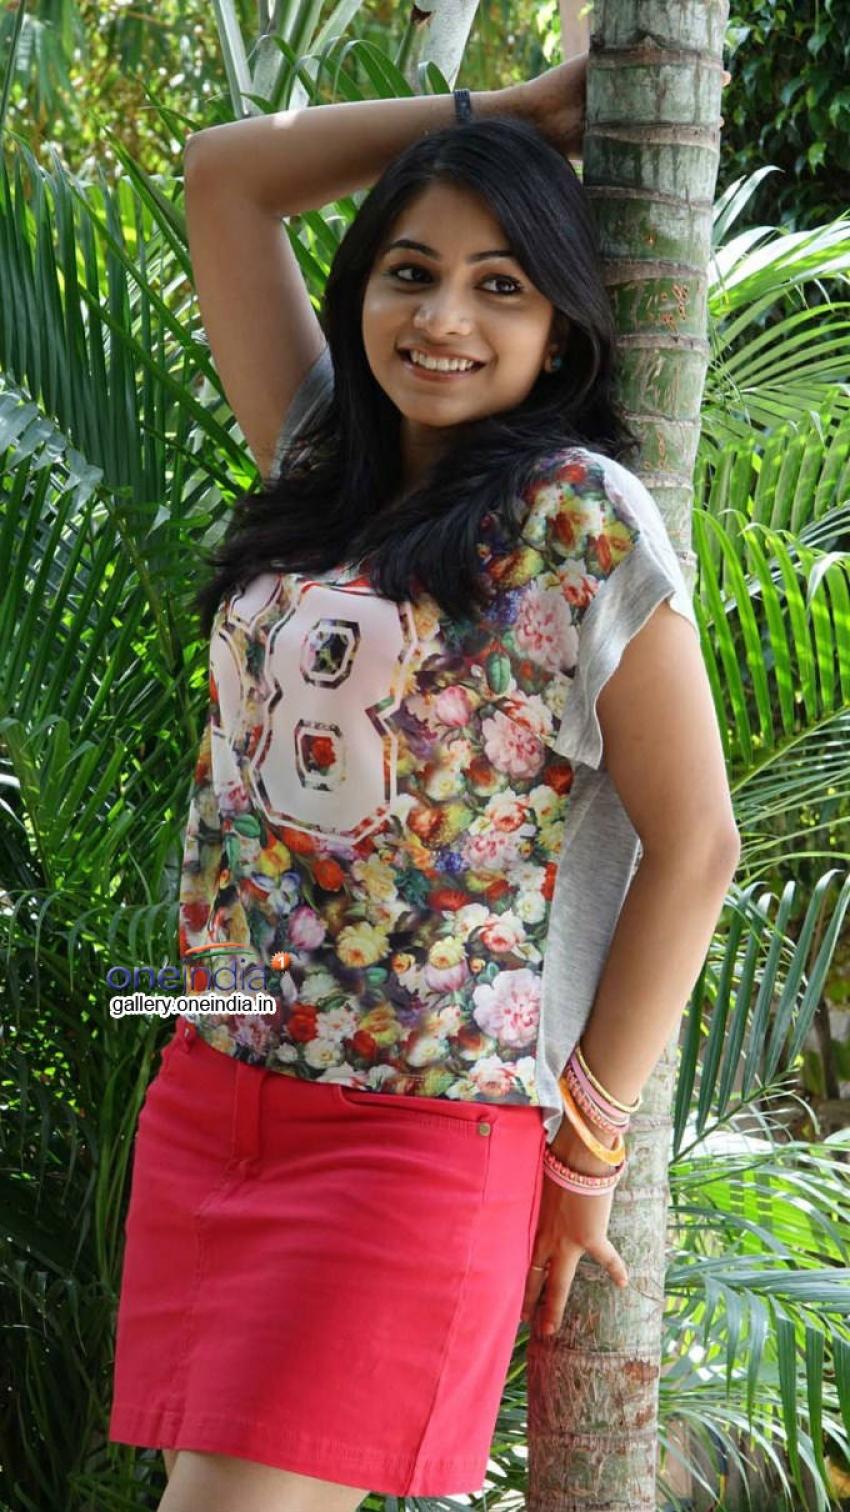 Panchadara Pachimirchi Photos